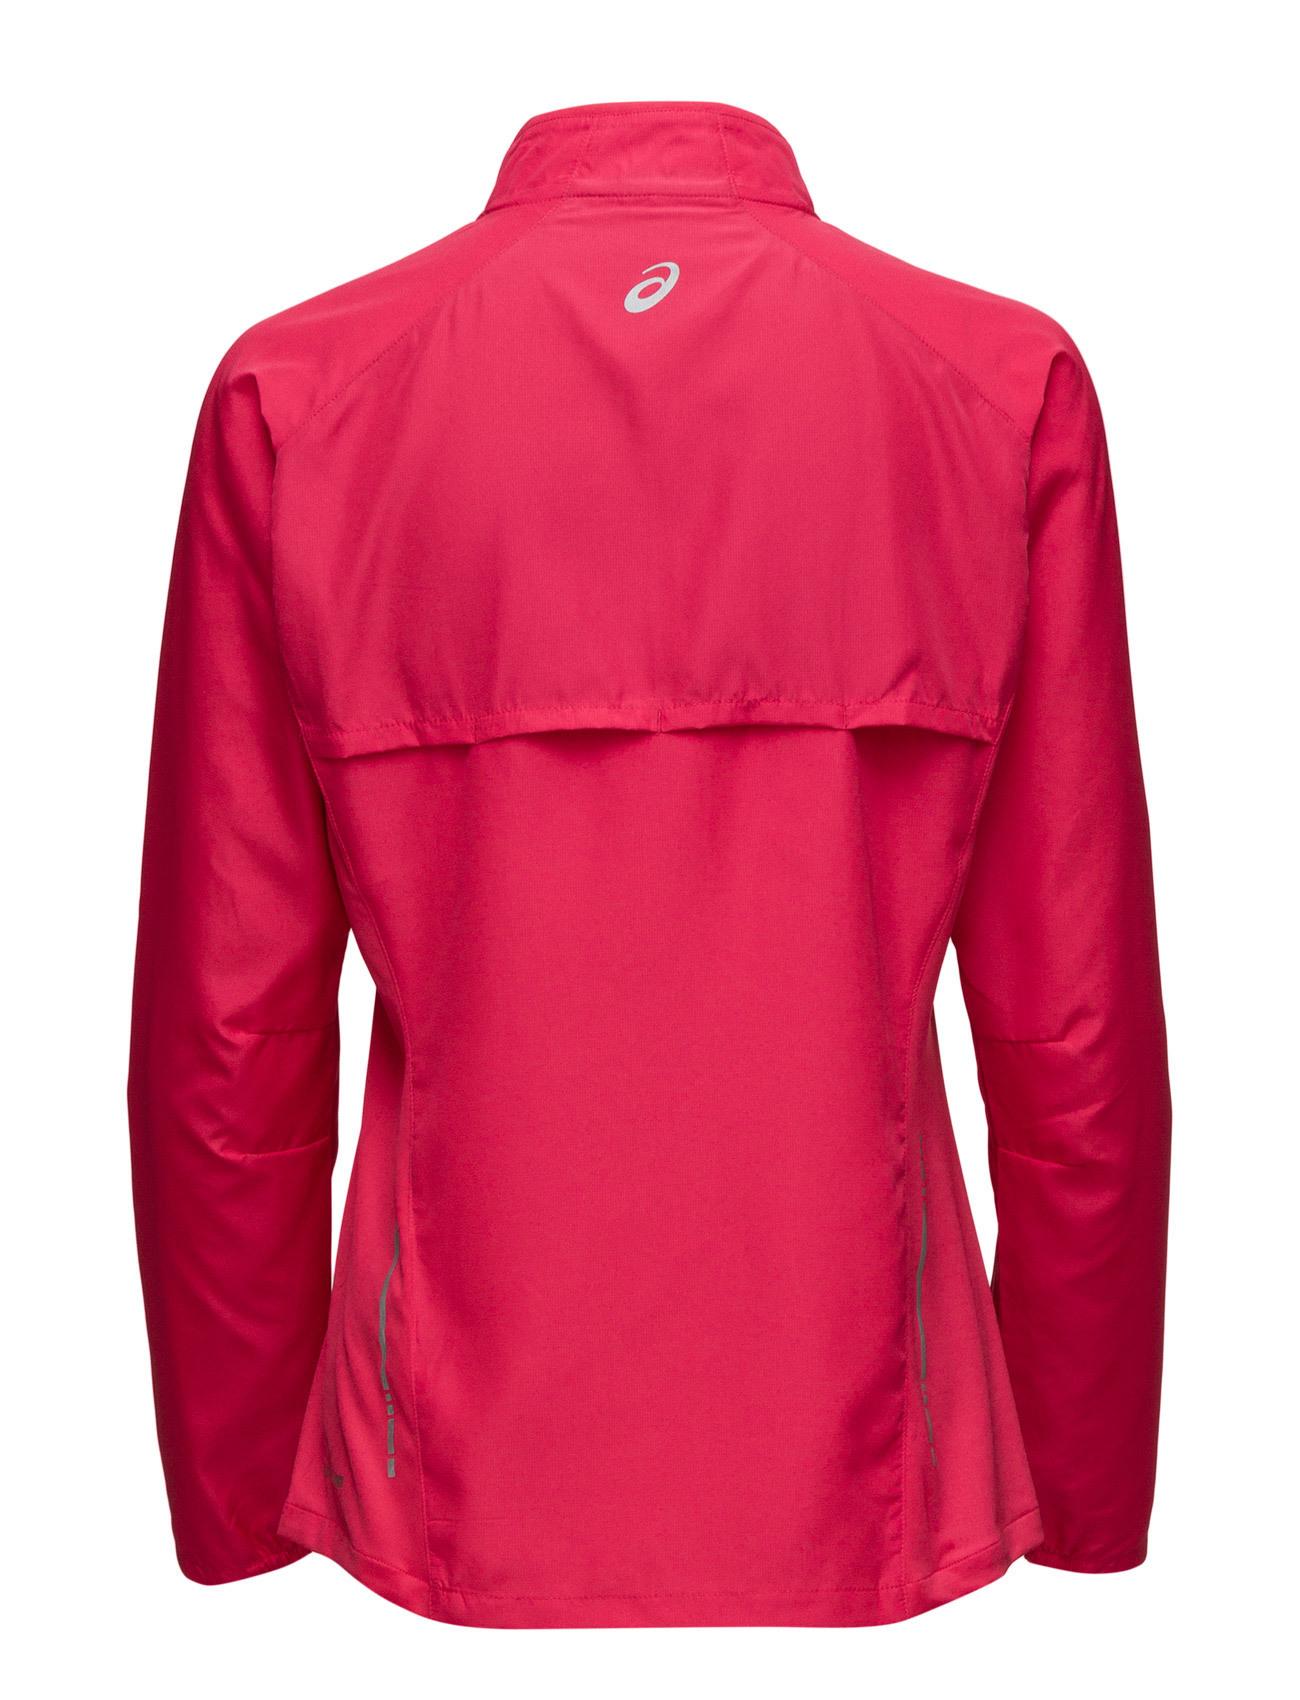 Женский костюм для бега Asics Woven Stripe (110426 6016-121333 0904) розовый фото